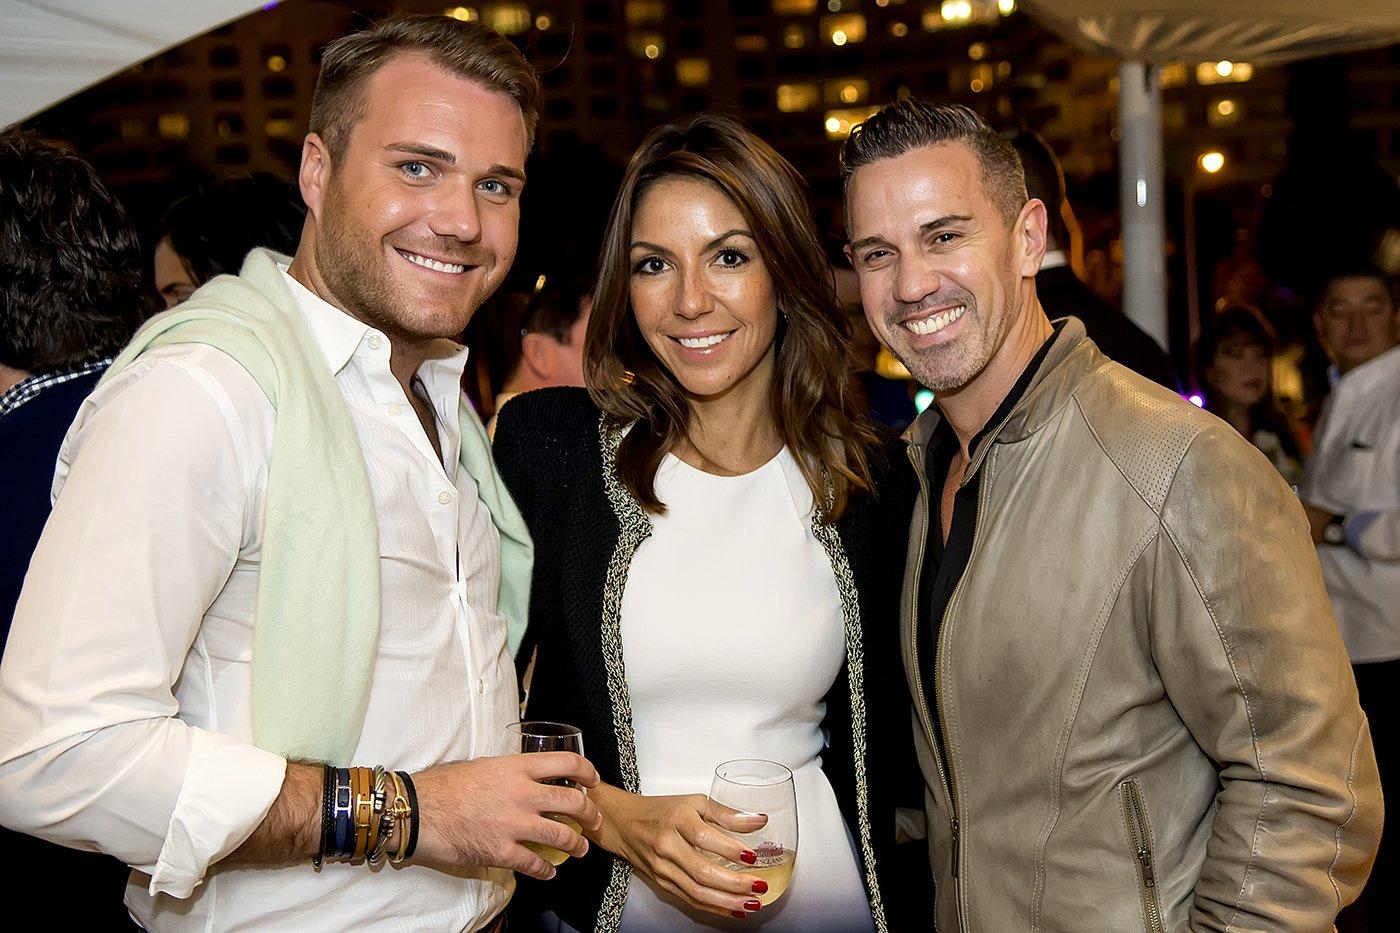 miami-yacht-show-2015-an-evening-on-la-pellegrina